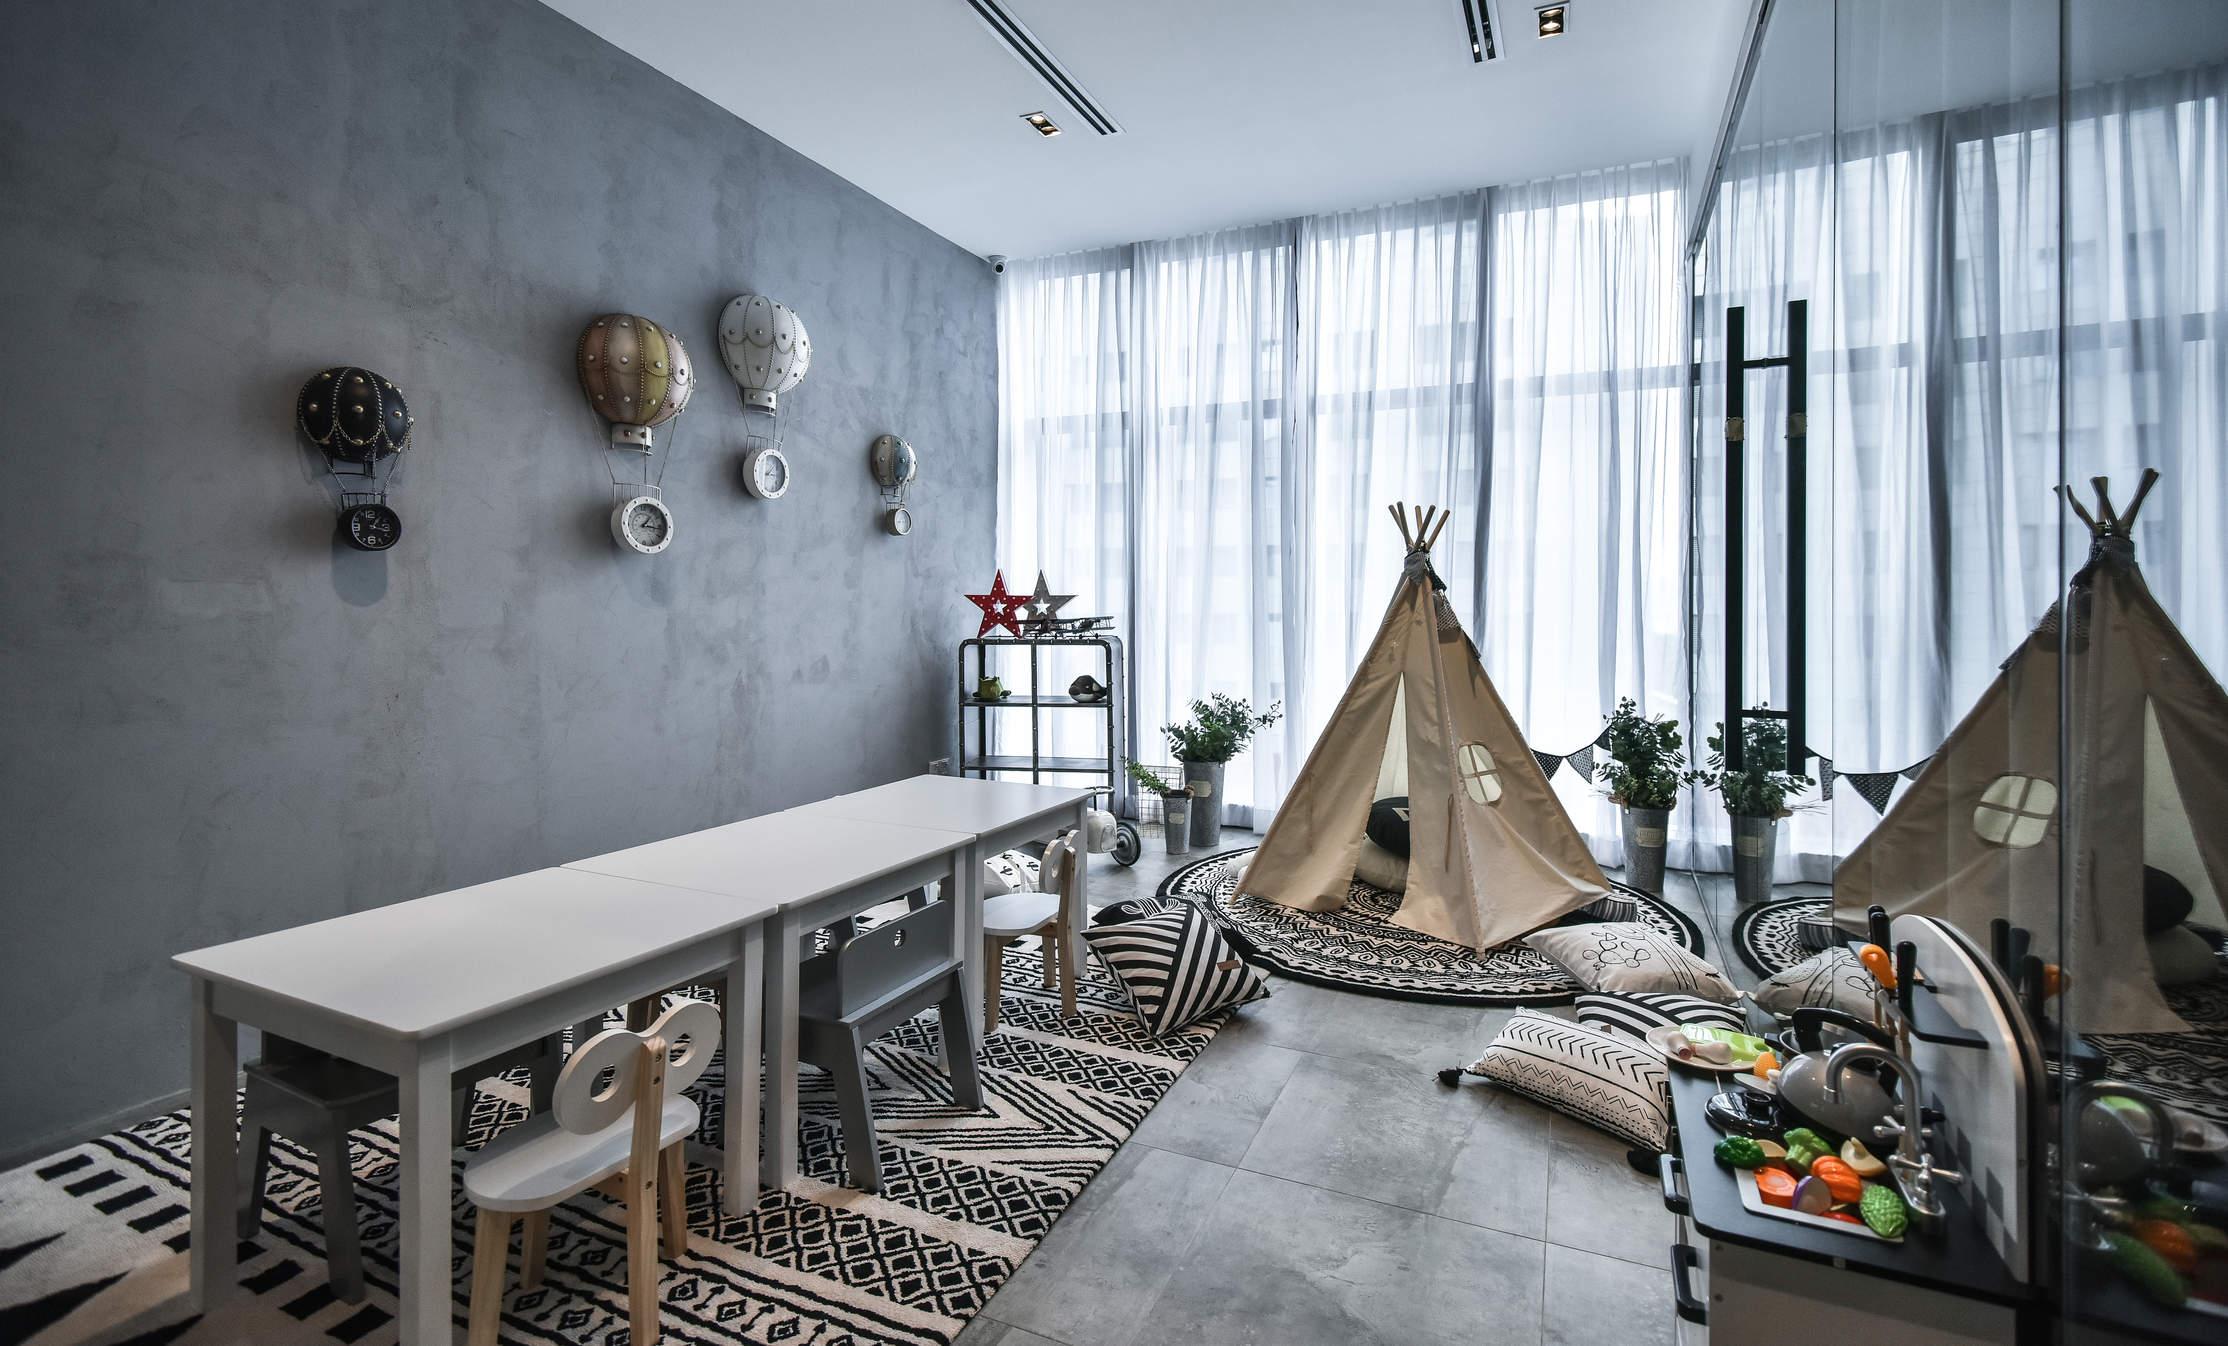 colony-coworking-space-star-boulevard-klcc-kids-play-room